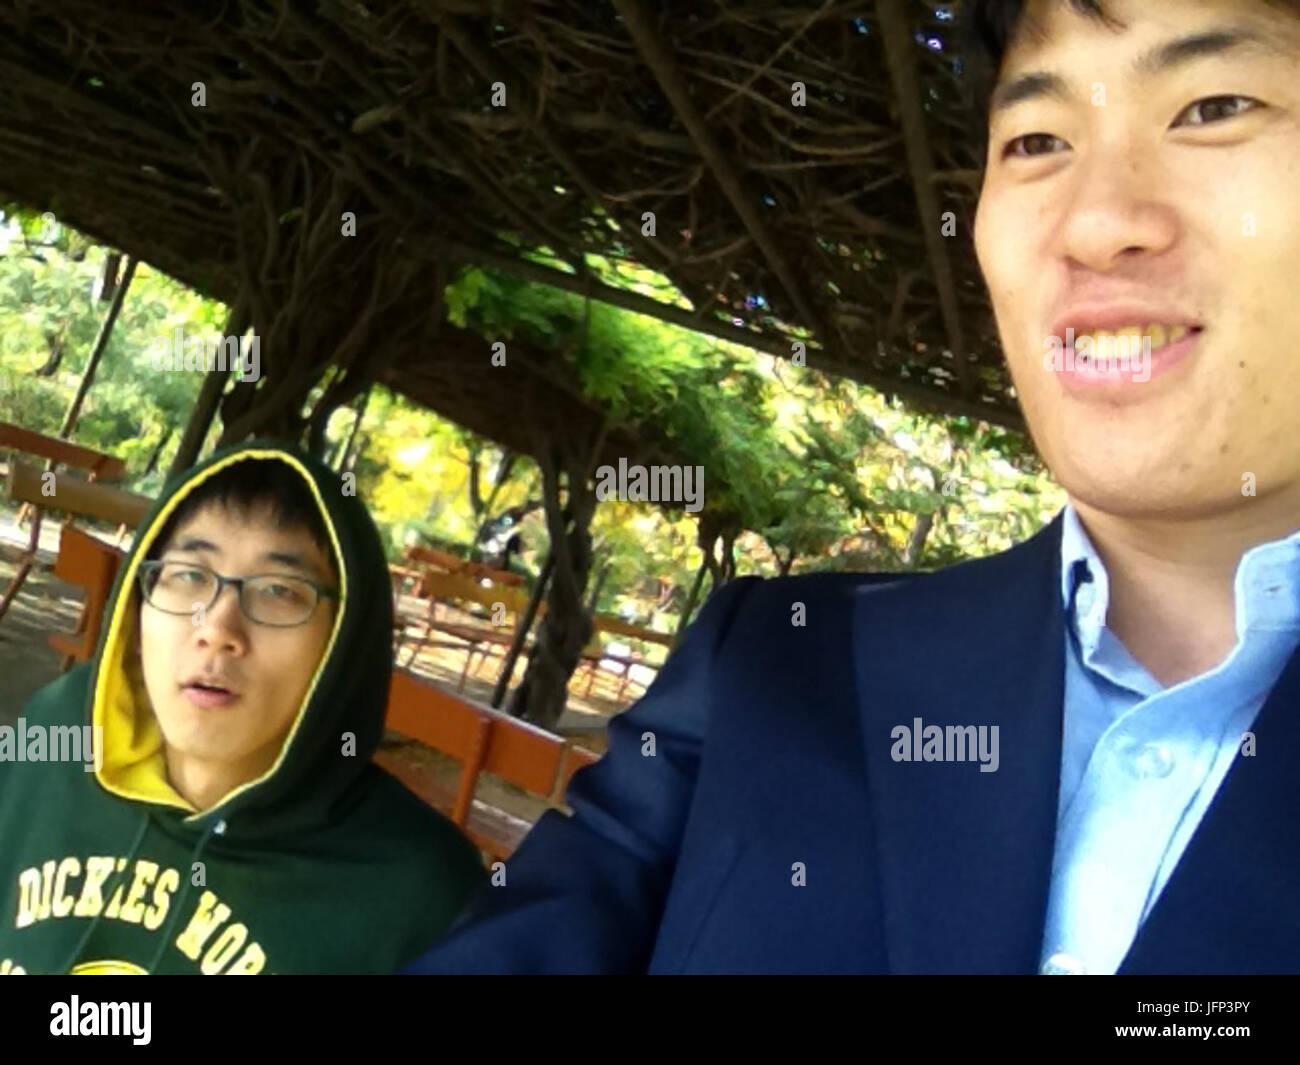 2012-10-28 15.14.47-2 BCE59BCAPI491EBAAA8 Choe Kwangmo s iPhone Photo Stock